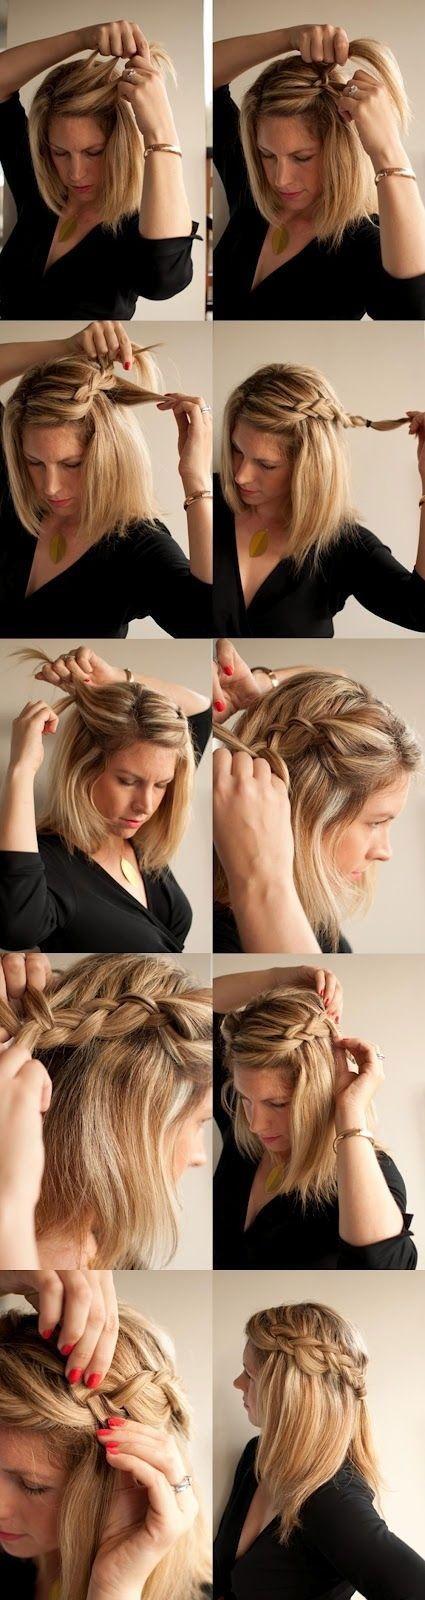 coiffures magnifiques pour cheveux courts   Hair style, Makeup and ...